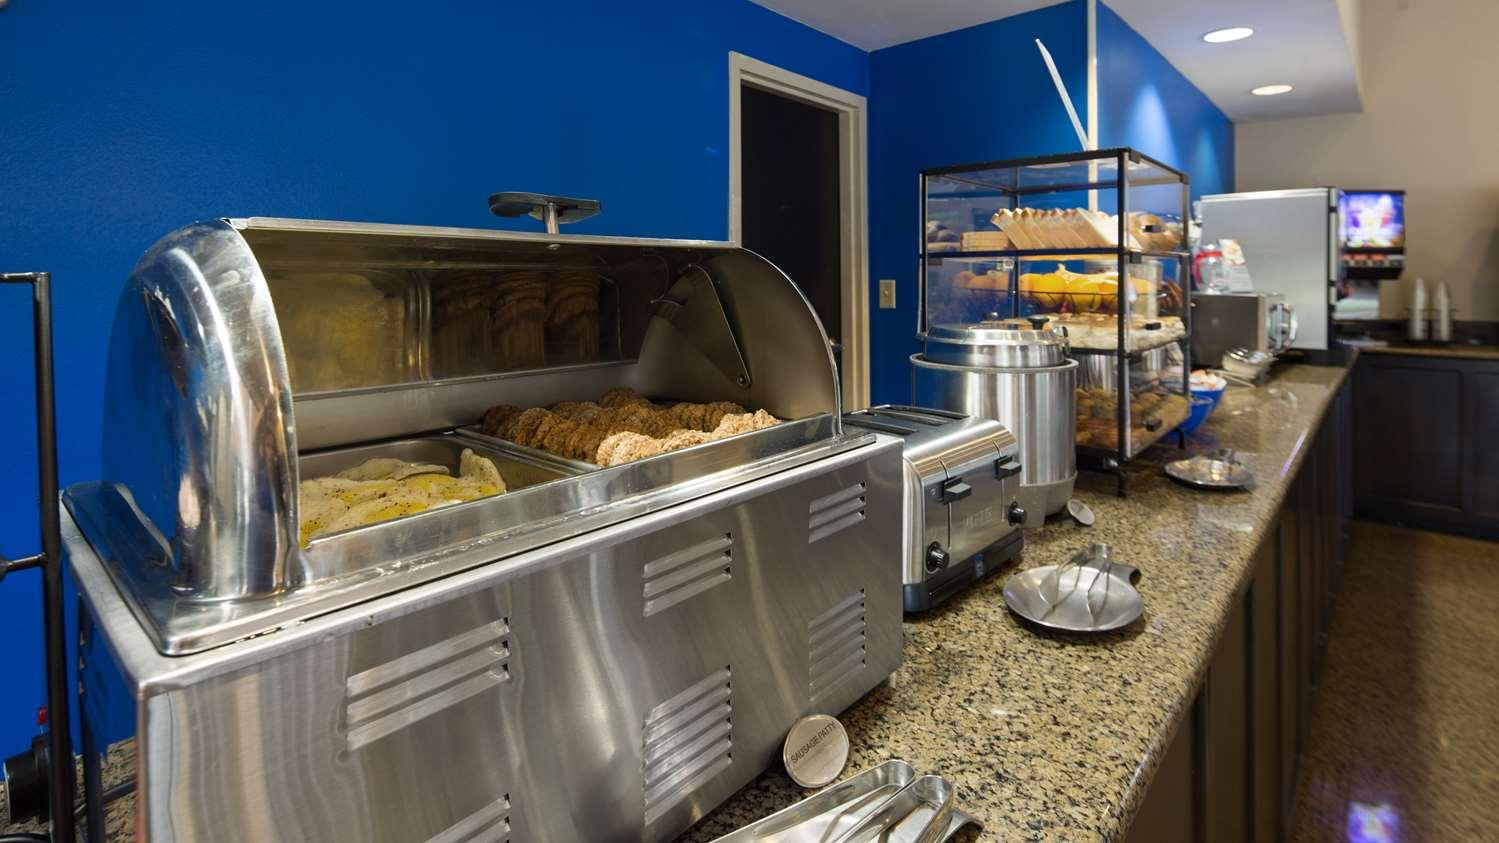 proam - Best Western Walterboro Inn